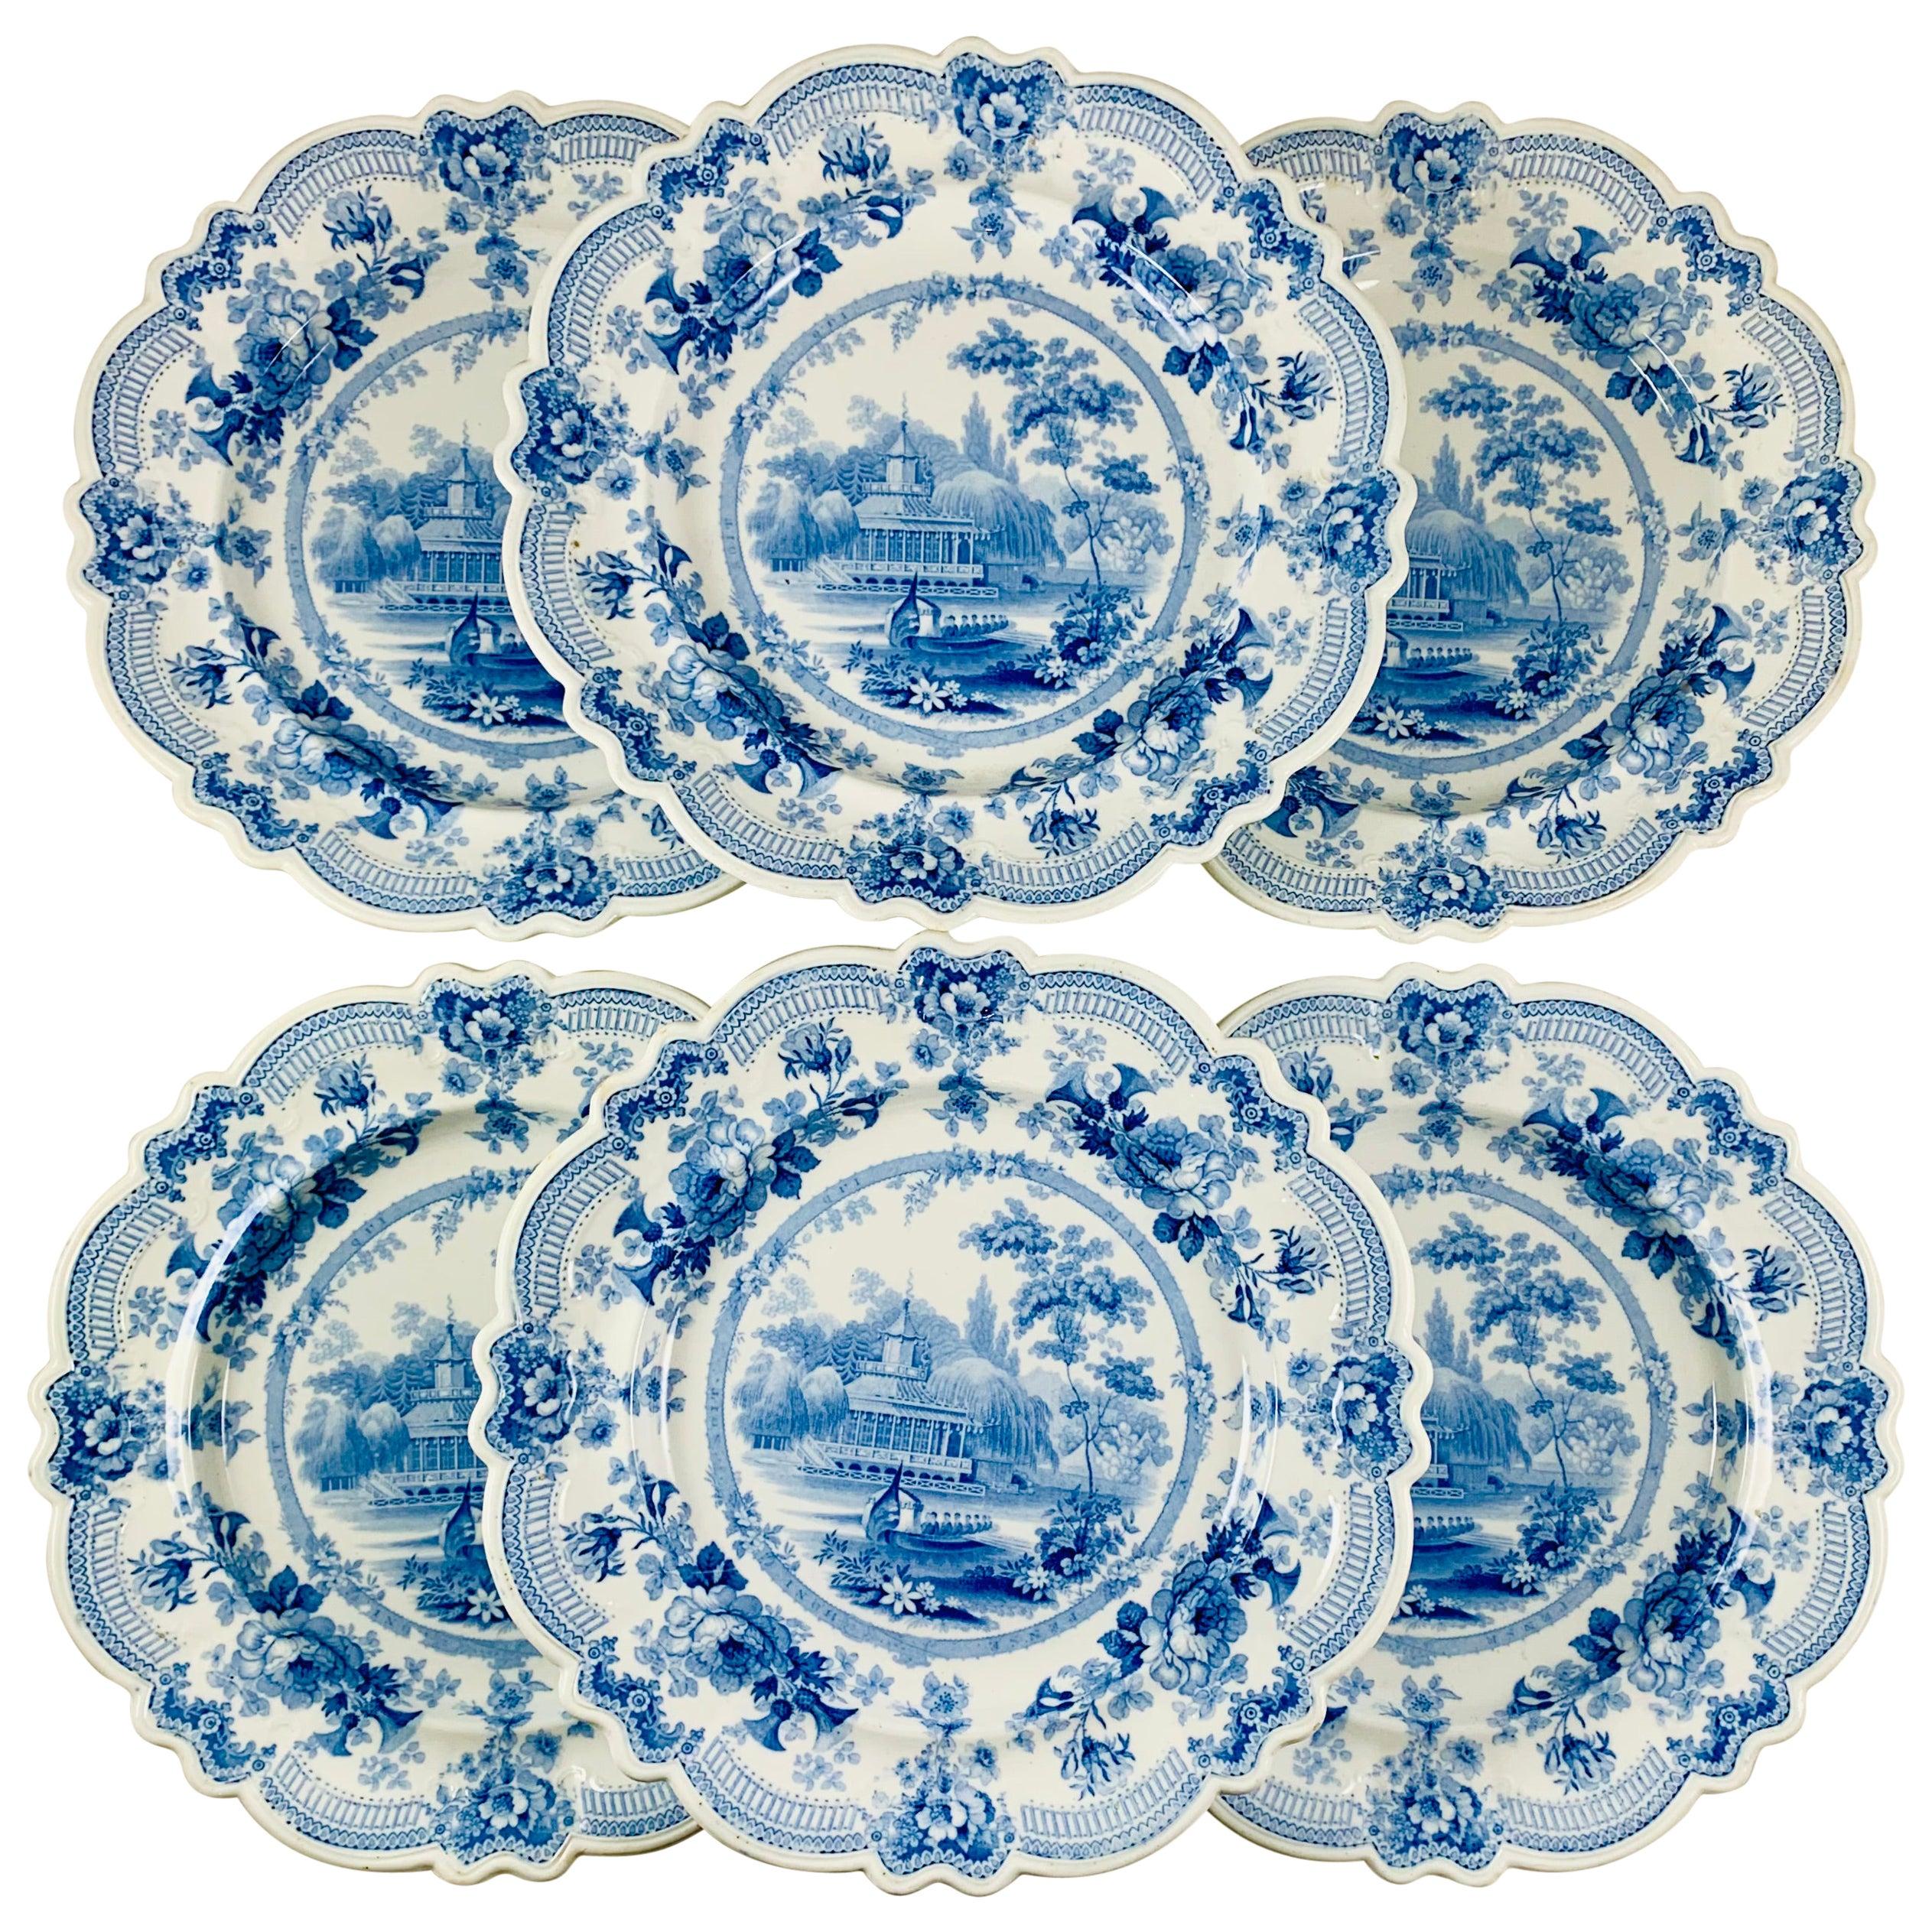 British Theme 'Royal Sketches' Blue on White Transferware Dinner Plates, Set/6